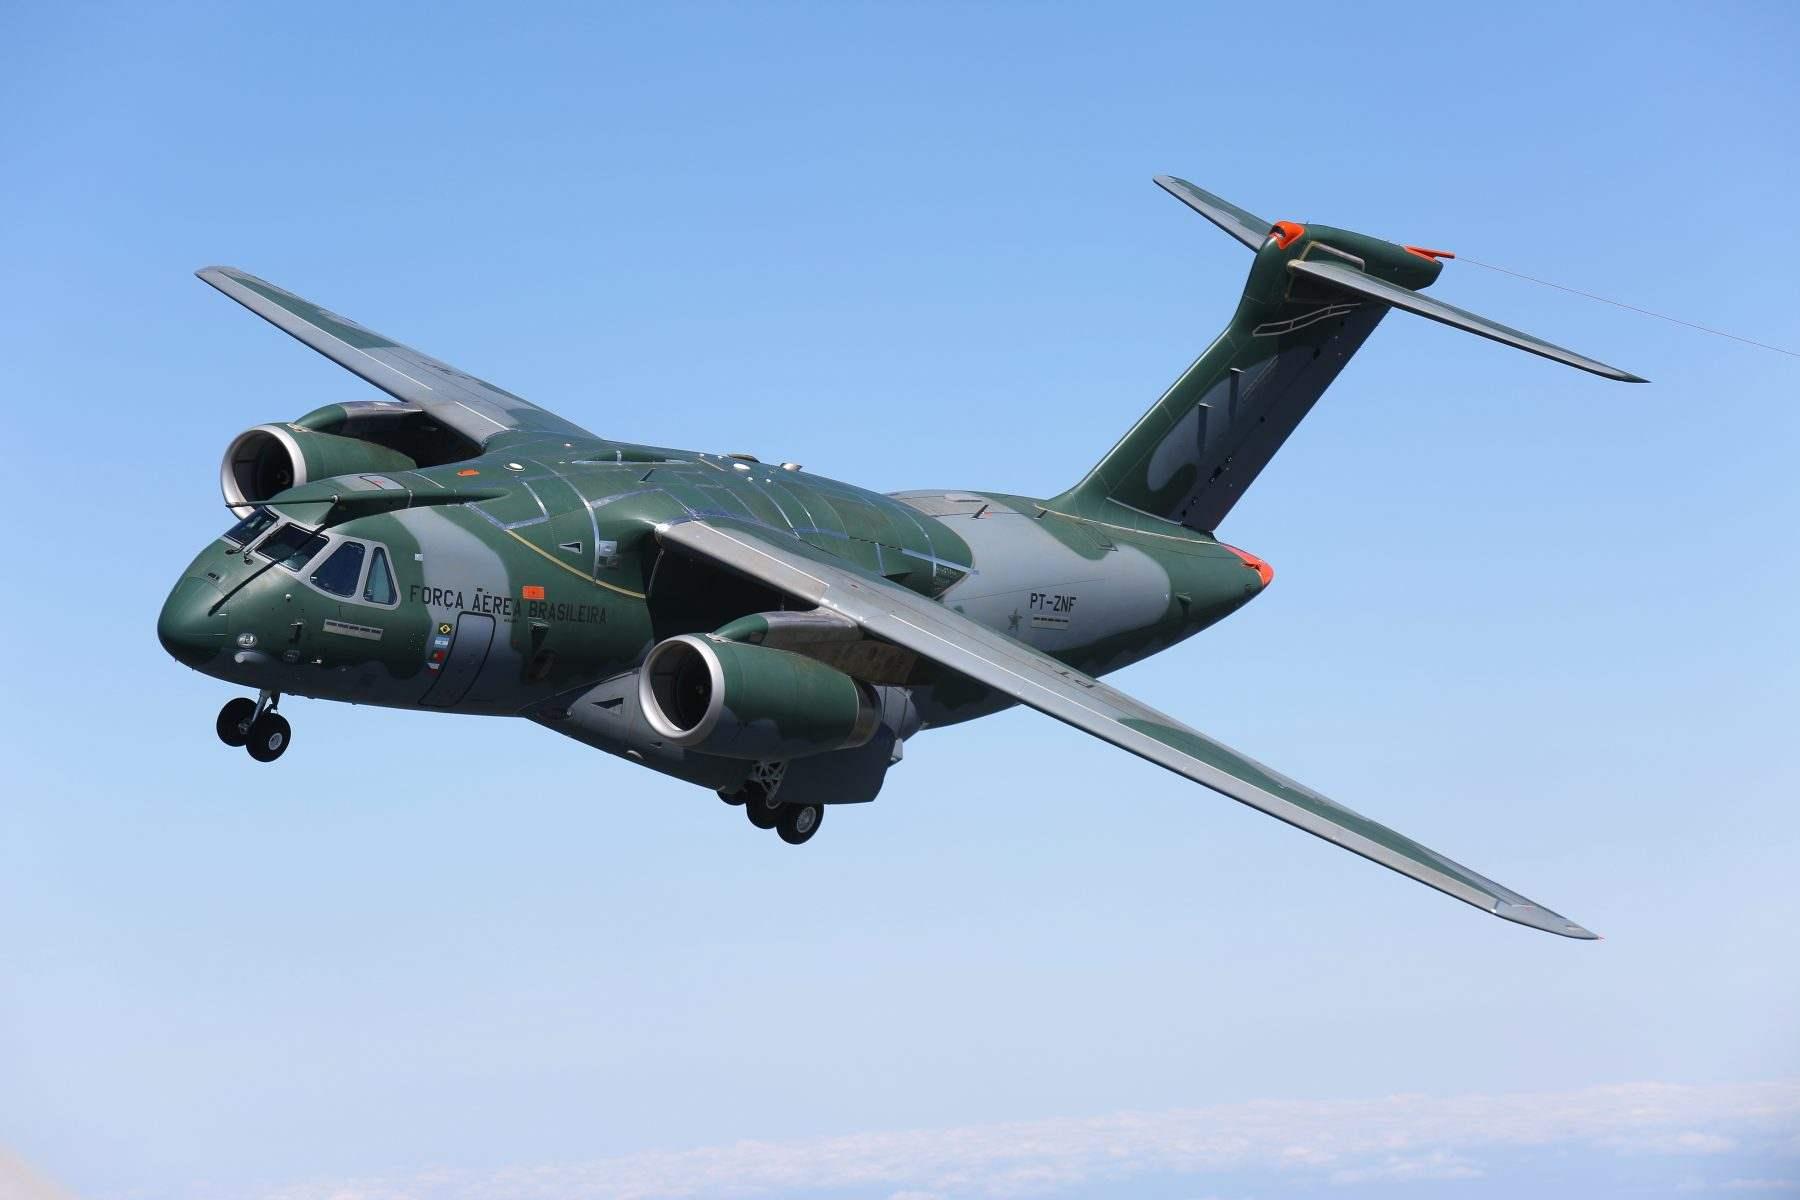 Embraer anuncia joint venture com Boeing para promover C-390